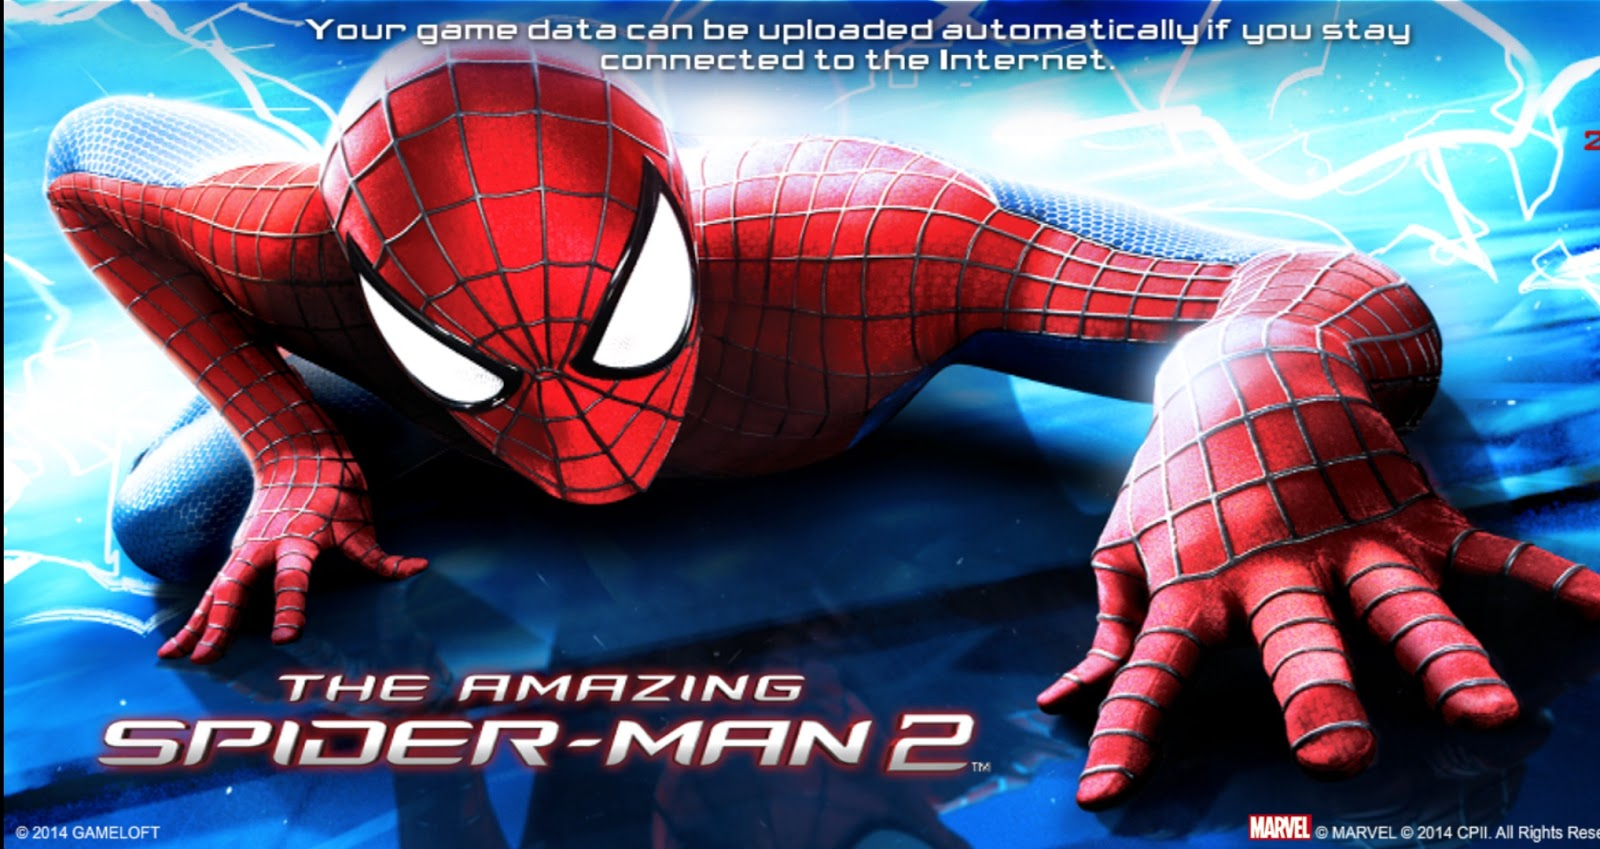 The Amazing Spiderman 2 Mega Mod Apk Data version 1 2 7d